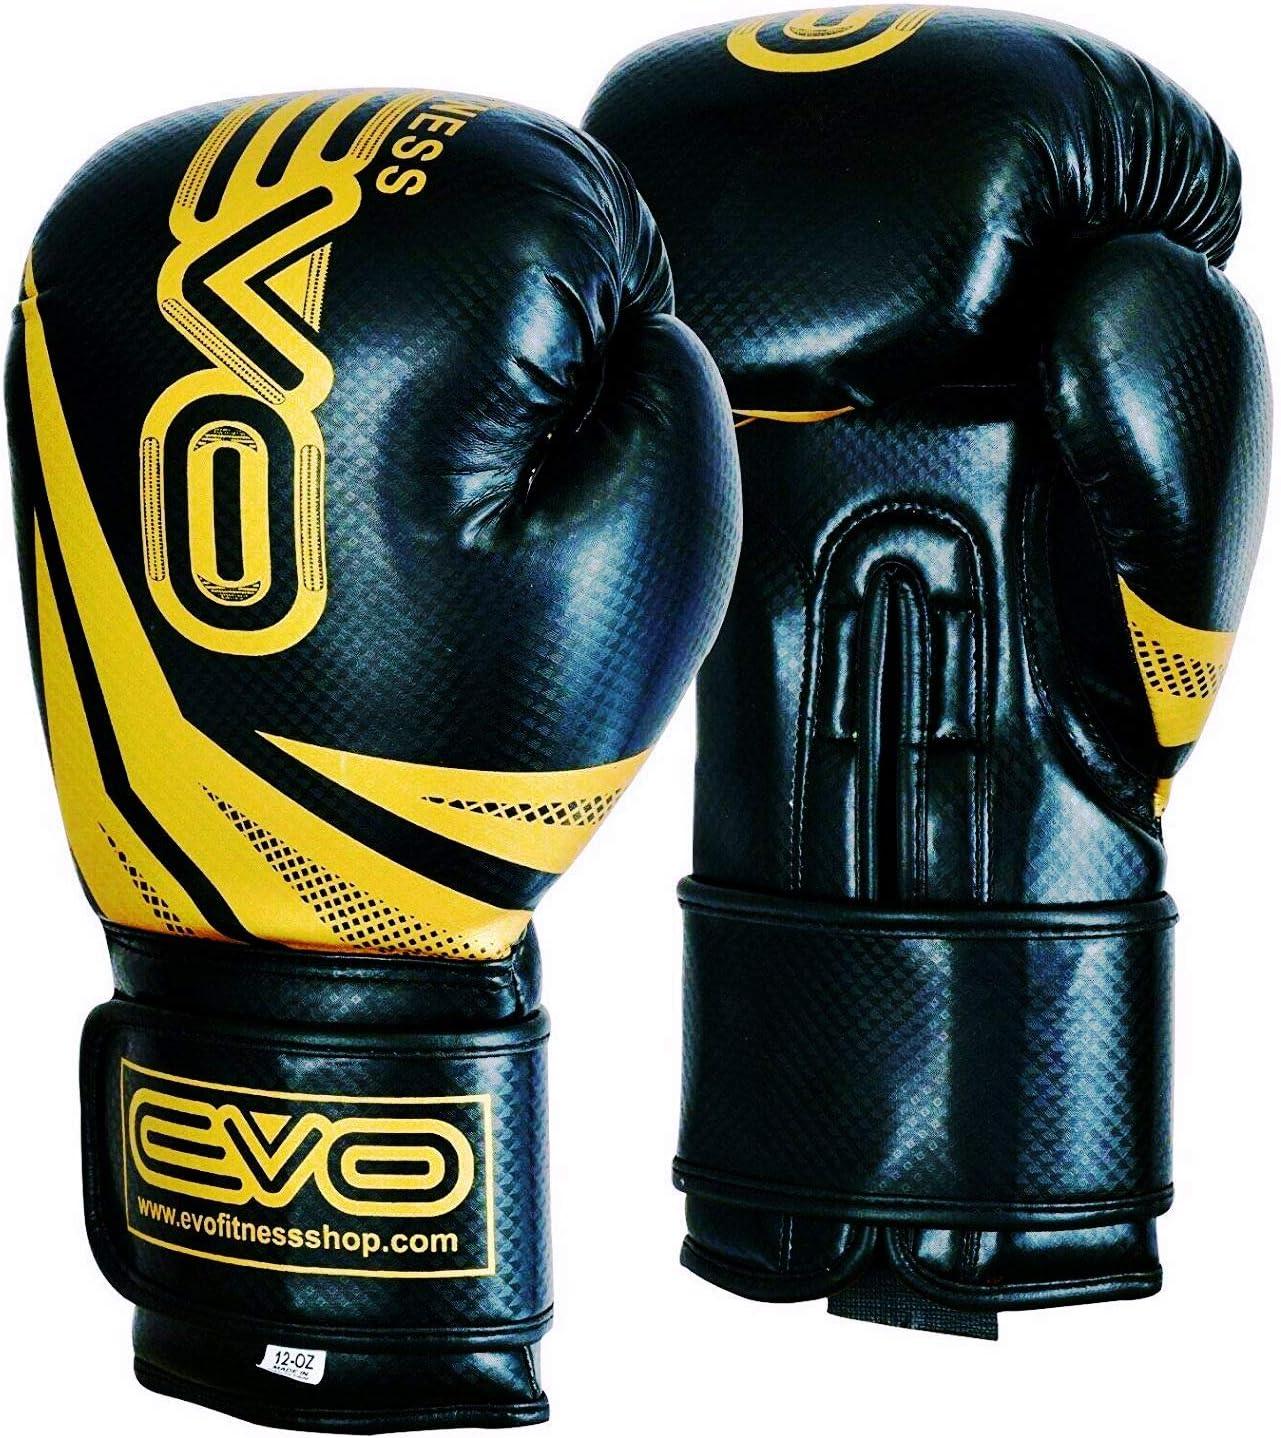 EVO Fitness Boxing hand wraps MMA Martial Arts Muay Thai Kick Boxing Martial Art